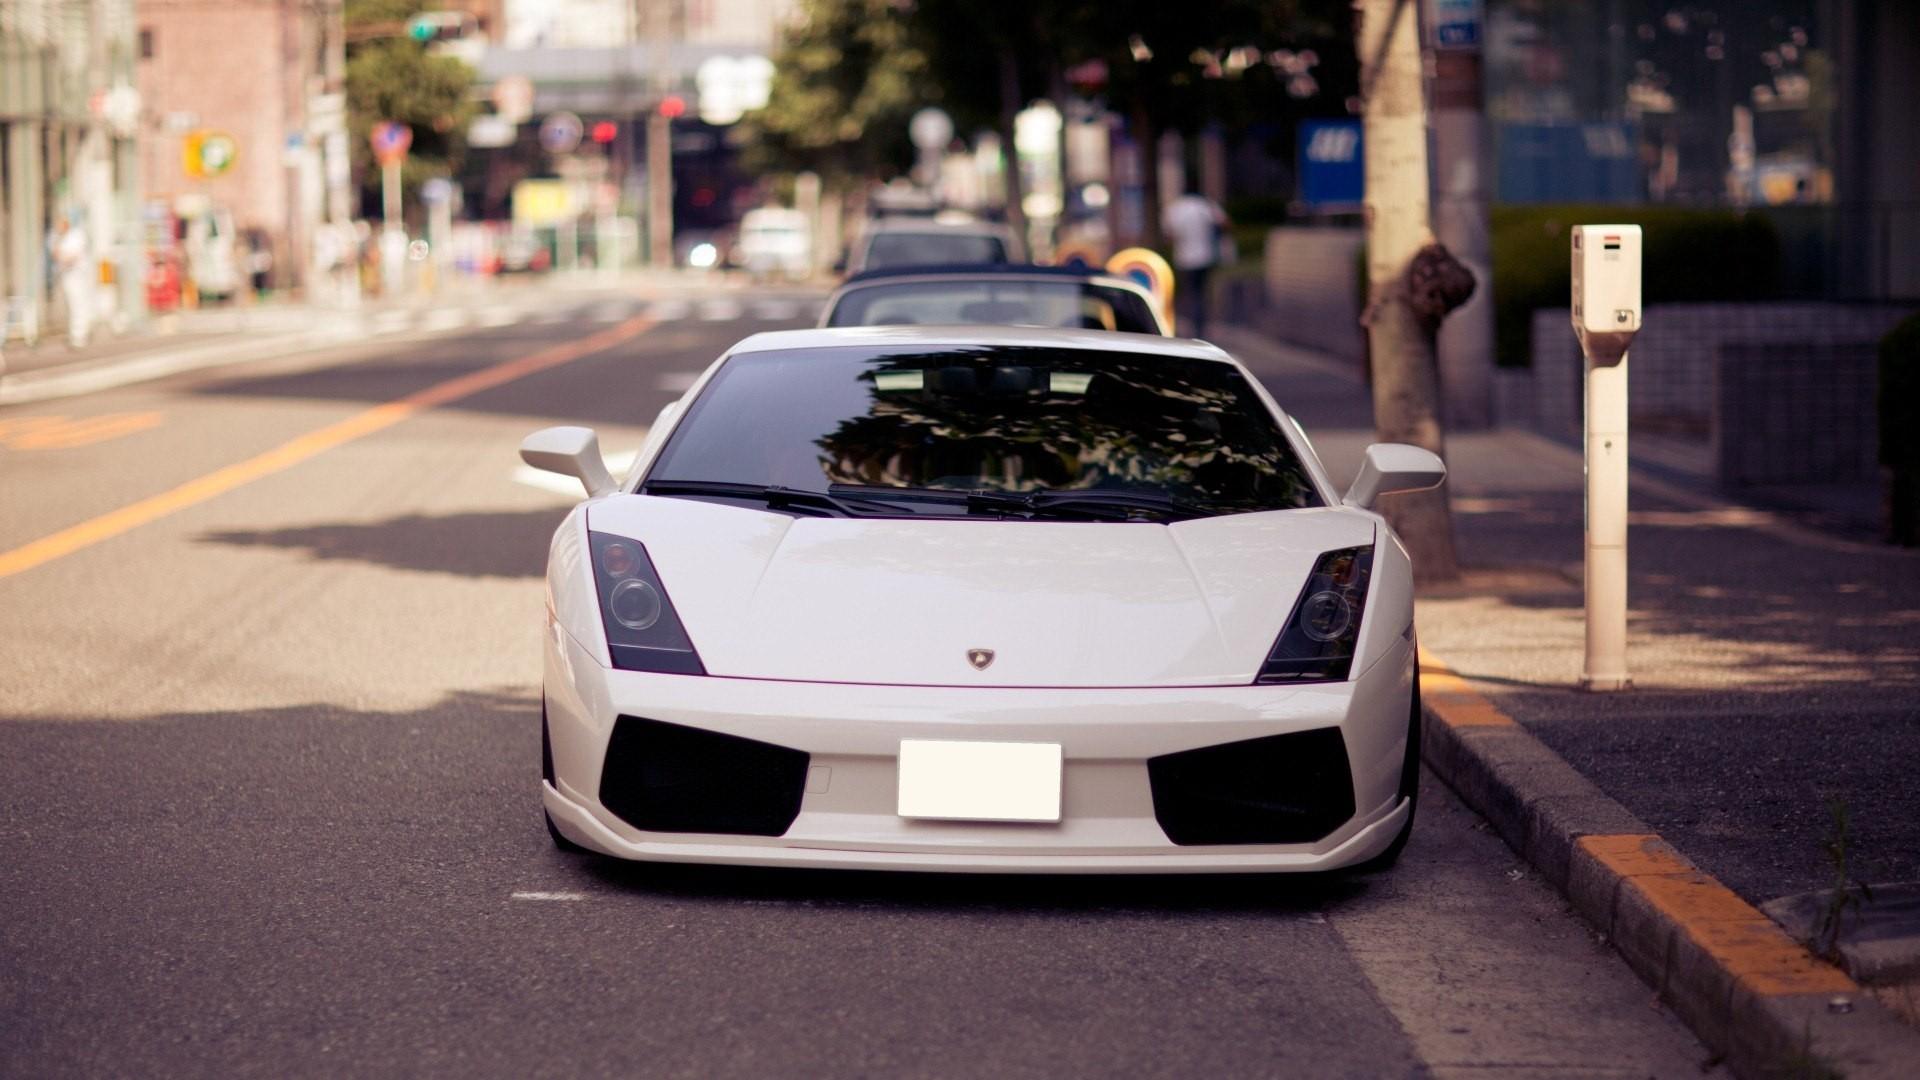 Auto, White, Sports Car